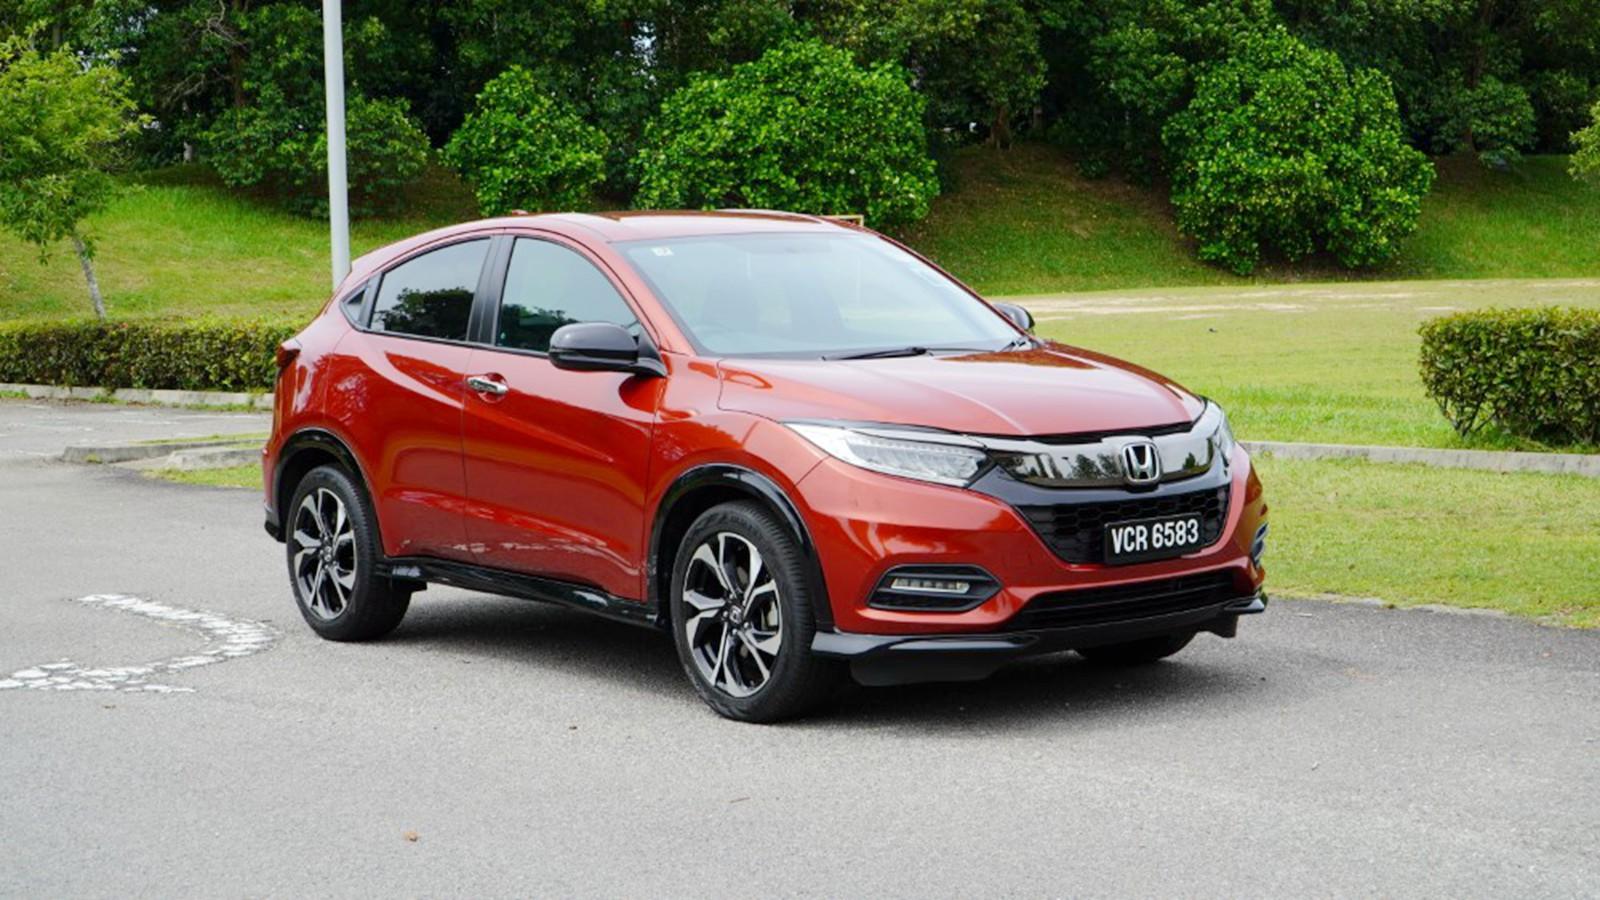 Honda Hr V 2020 Price In Malaysia From Rm104 000 Reviews Specs Wapcar My